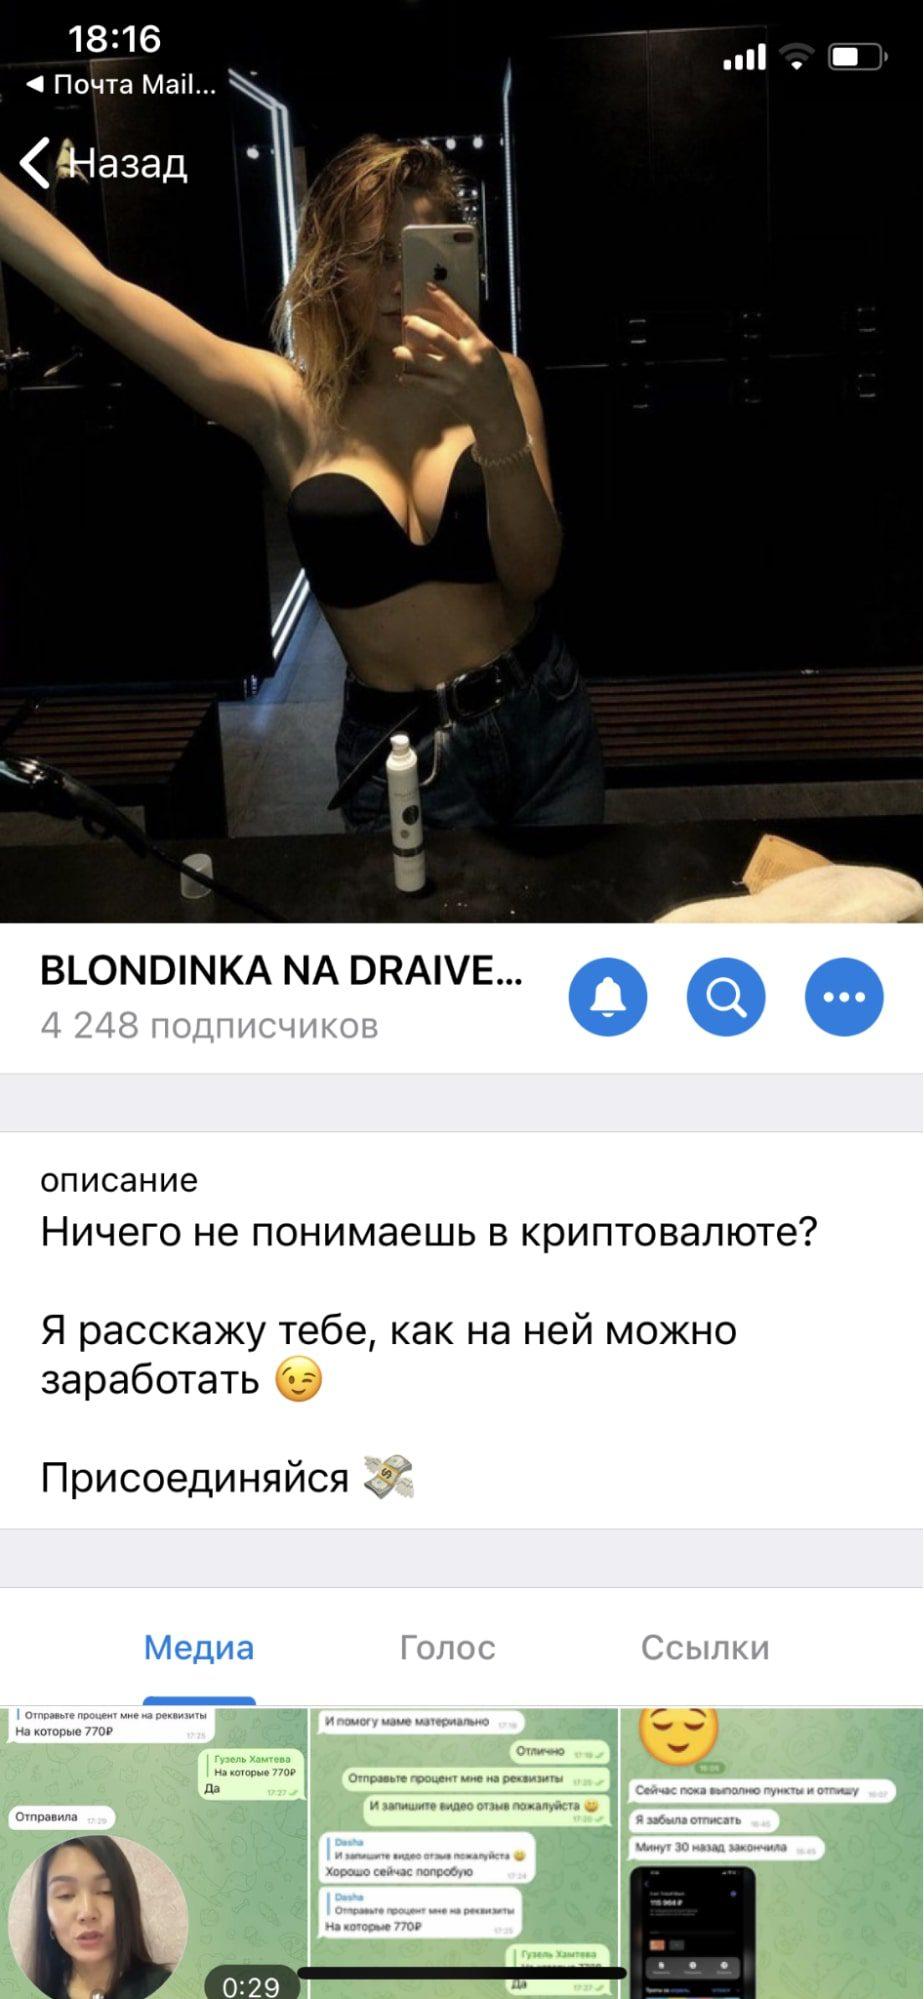 Блондинка на драйве Телеграмм